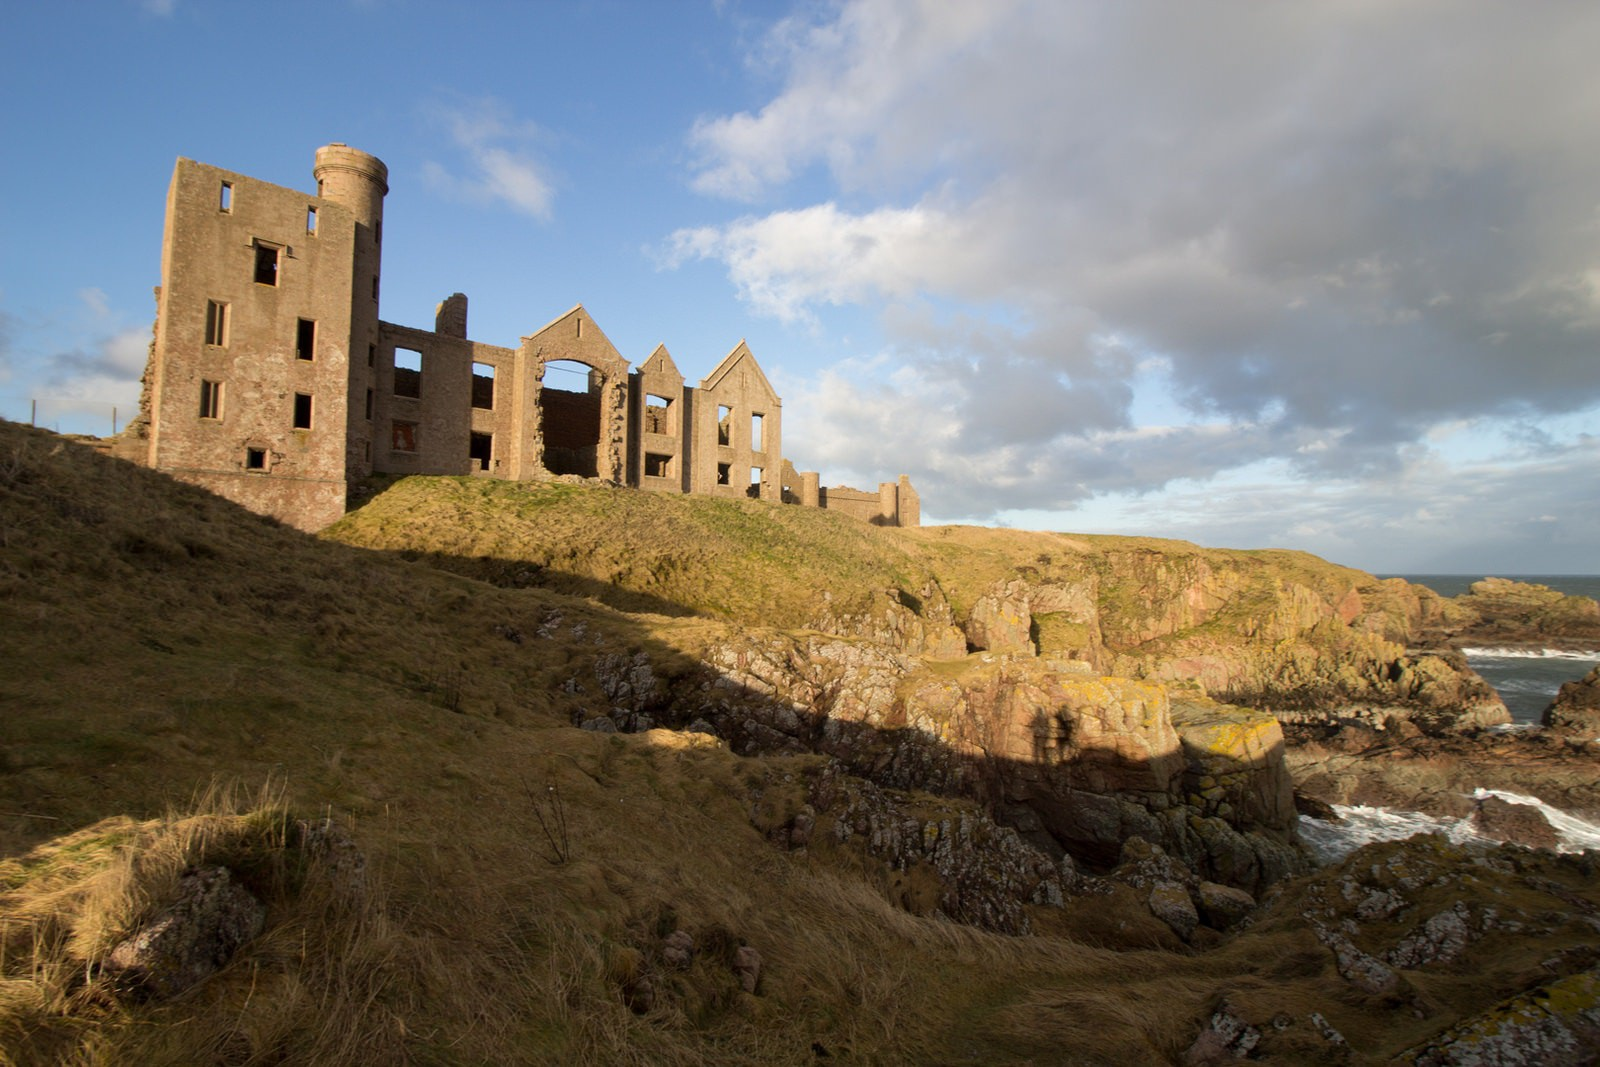 New Slains Castle | © phillpill/Flickr